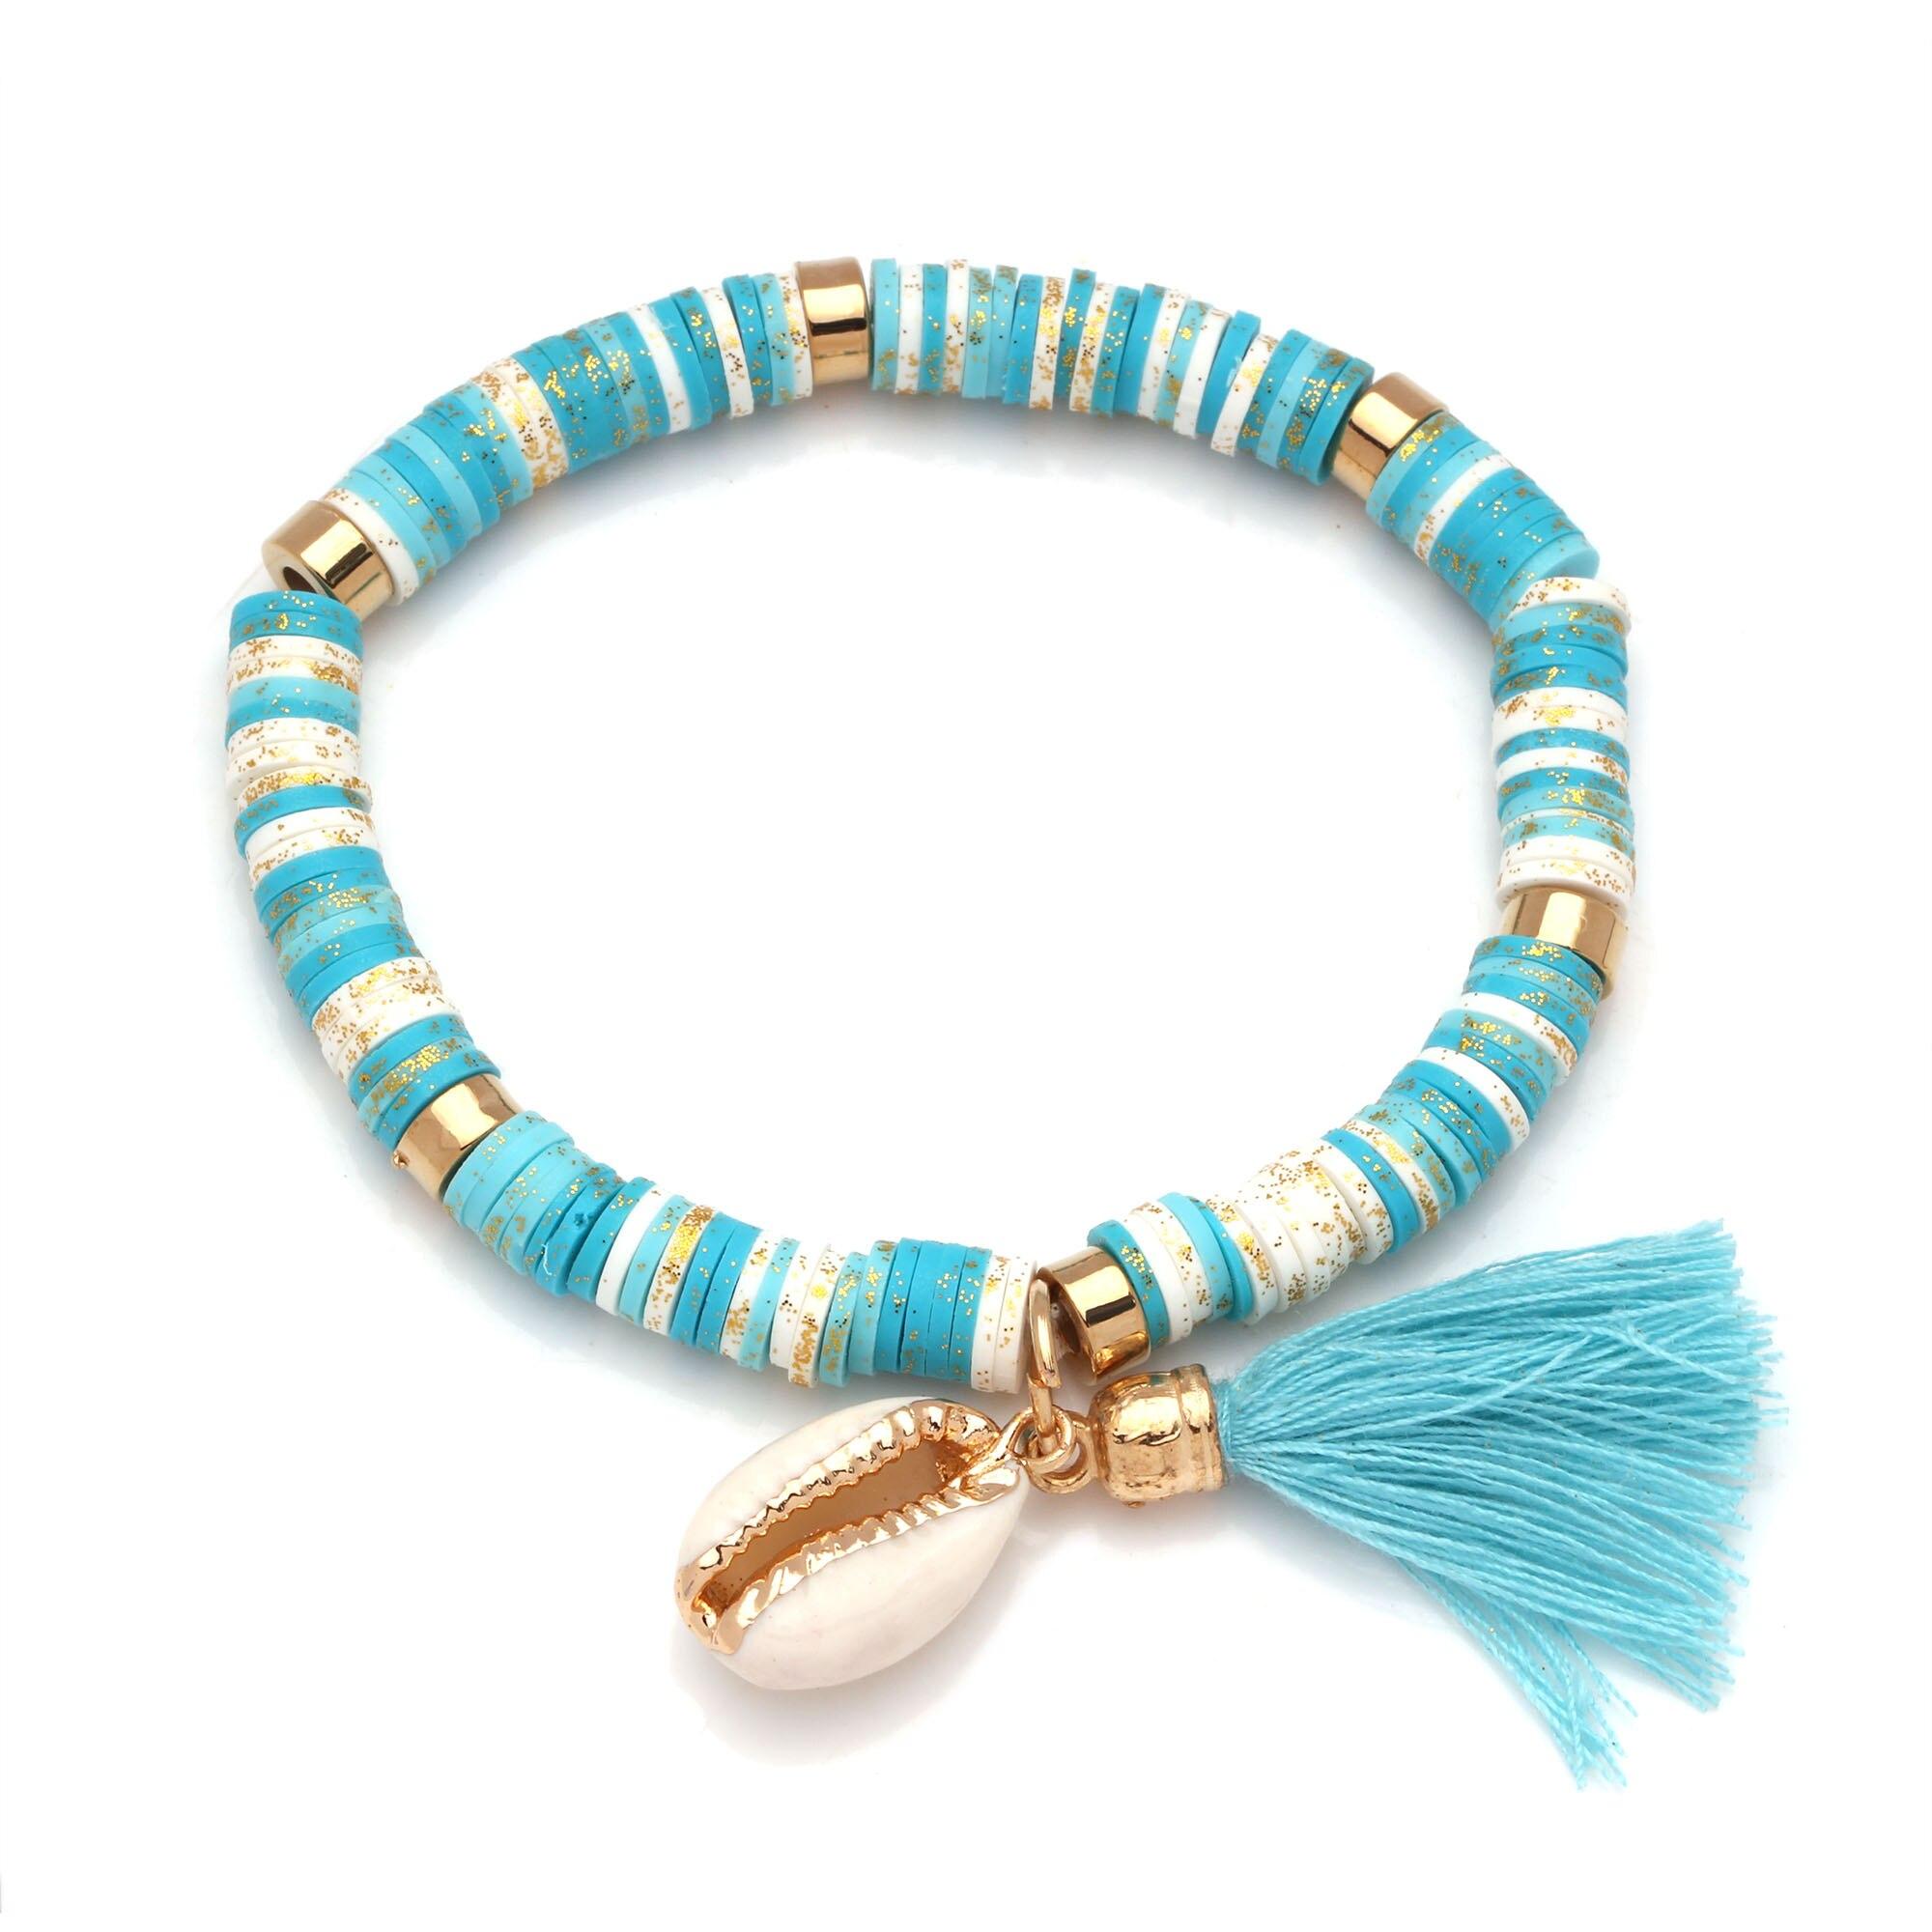 Boho Heishi Beads Cowrie Seashell Tassels Stretch Bracelet Women Men Polymer Clay Pink Red White Green Surf Beach Jewelry Gift